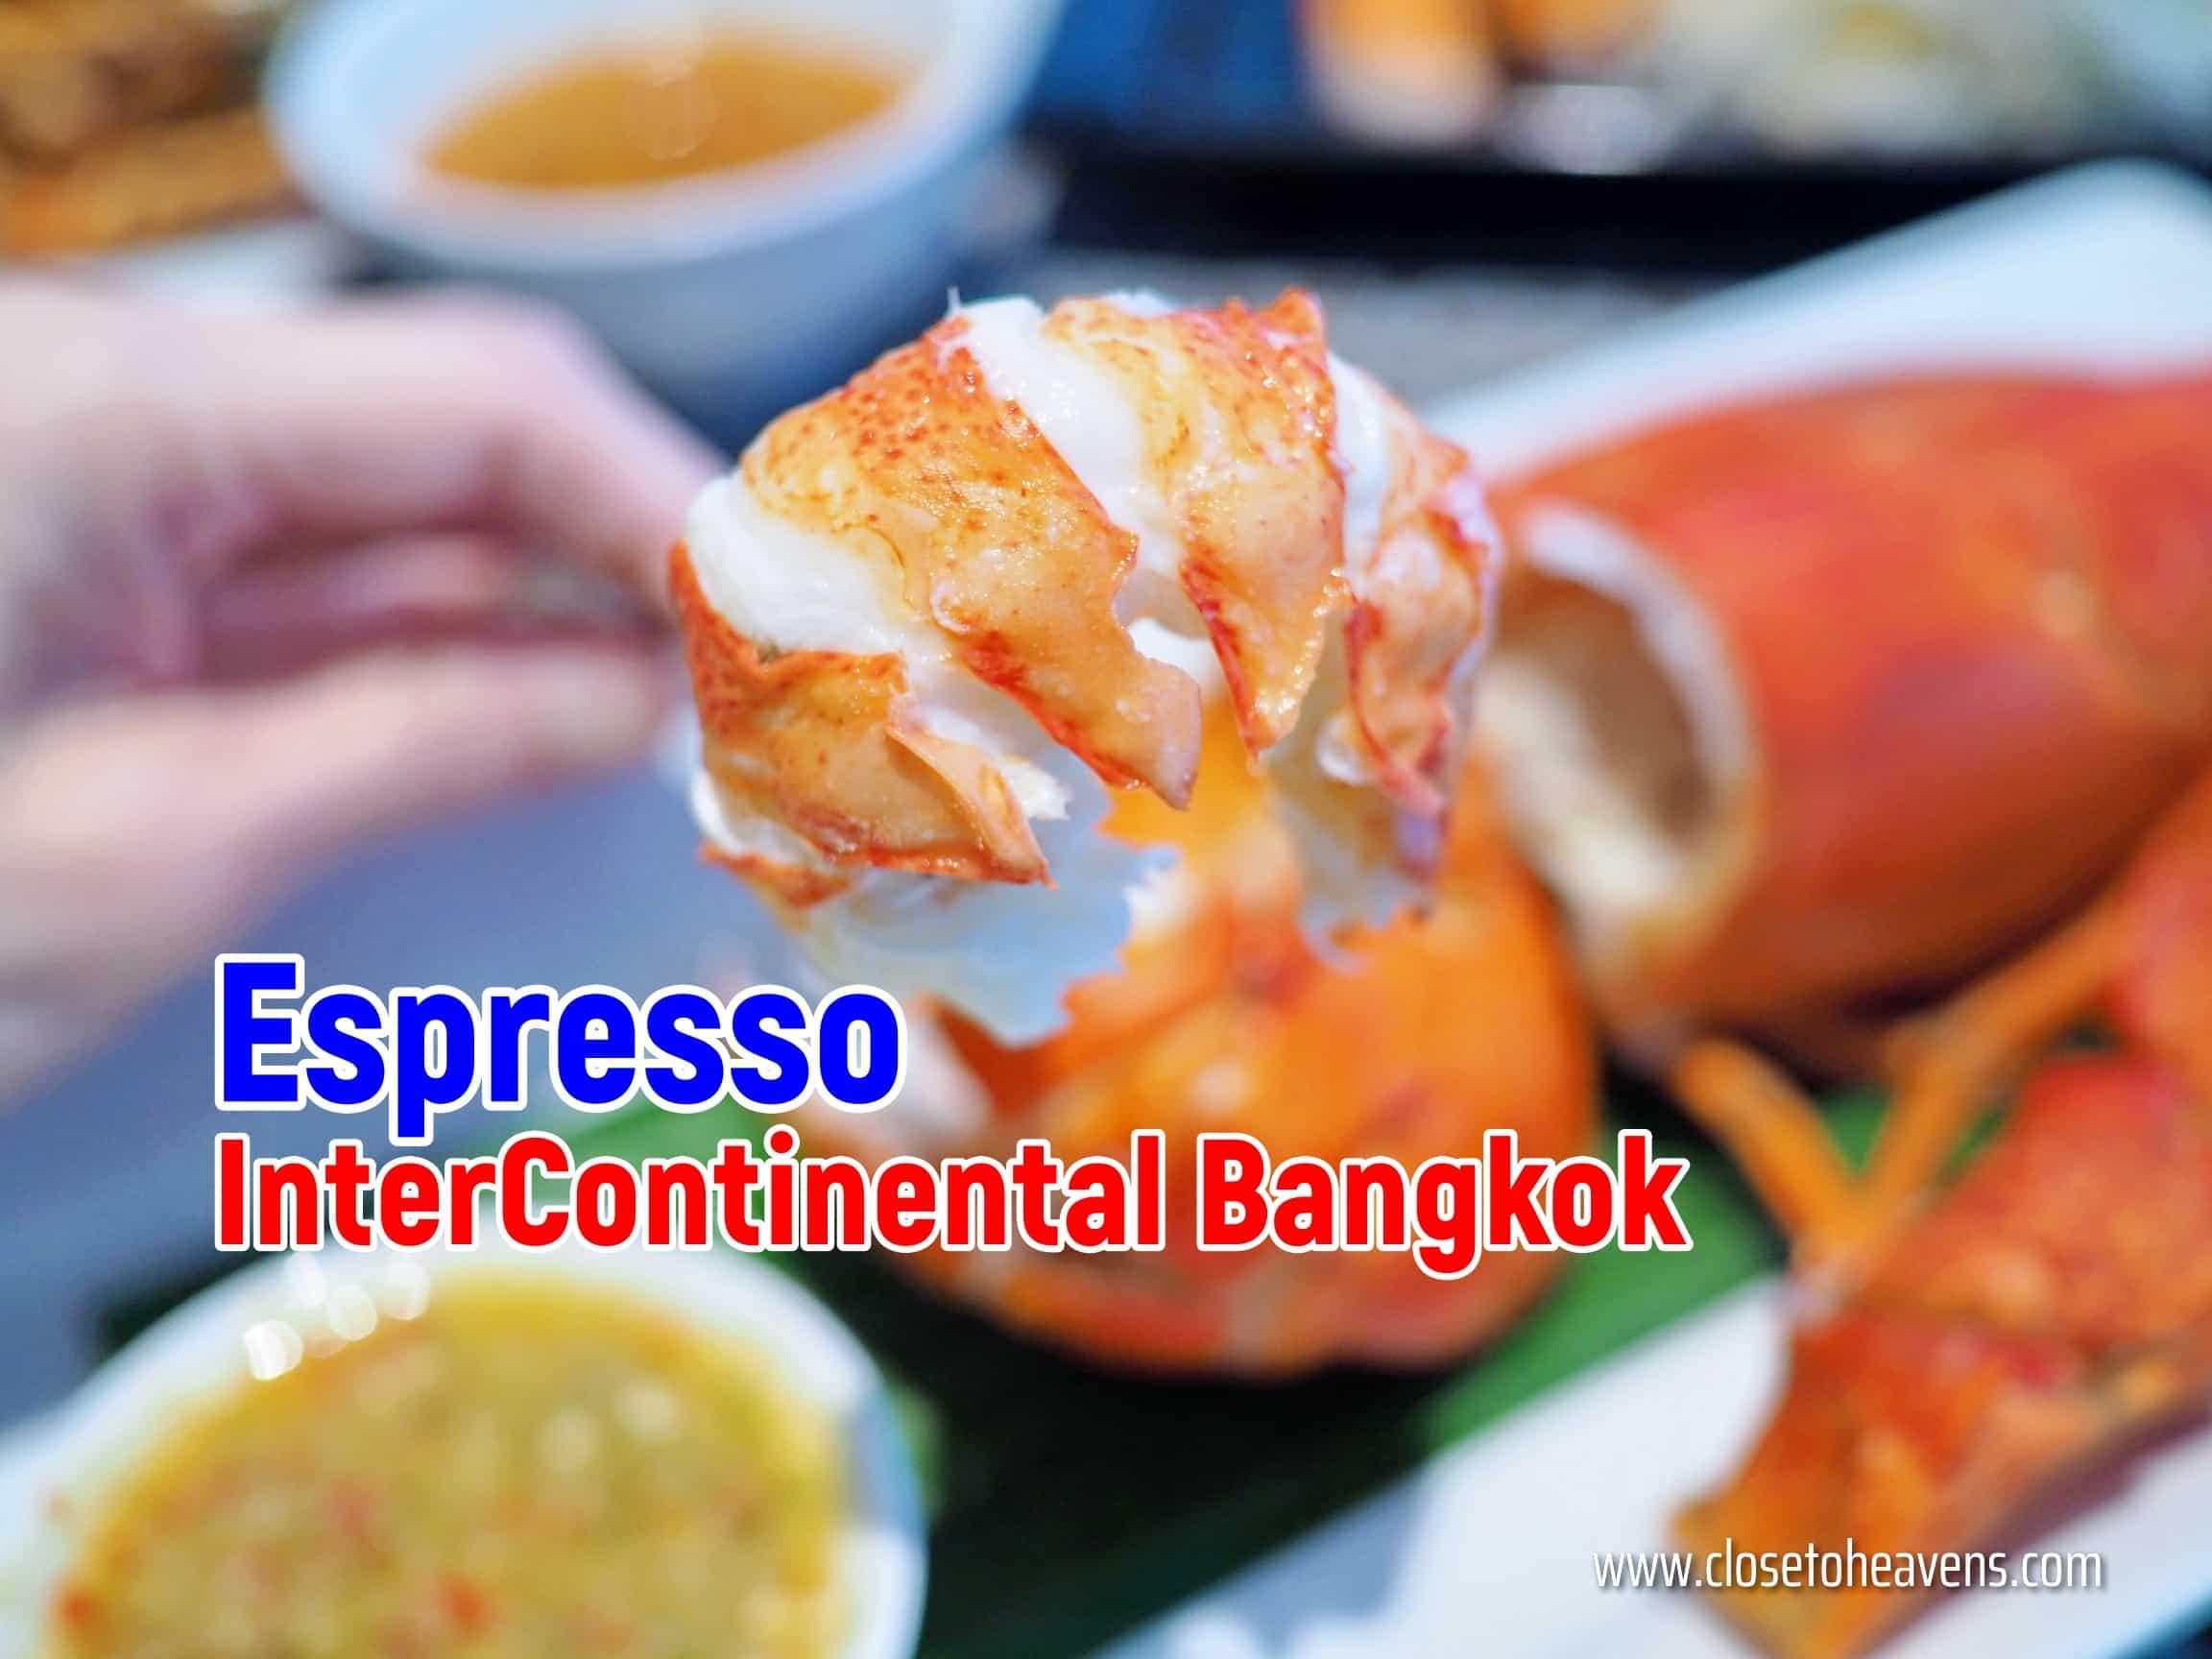 Sunday Brunch Buffet @ Espresso, InterContinental Bangkok